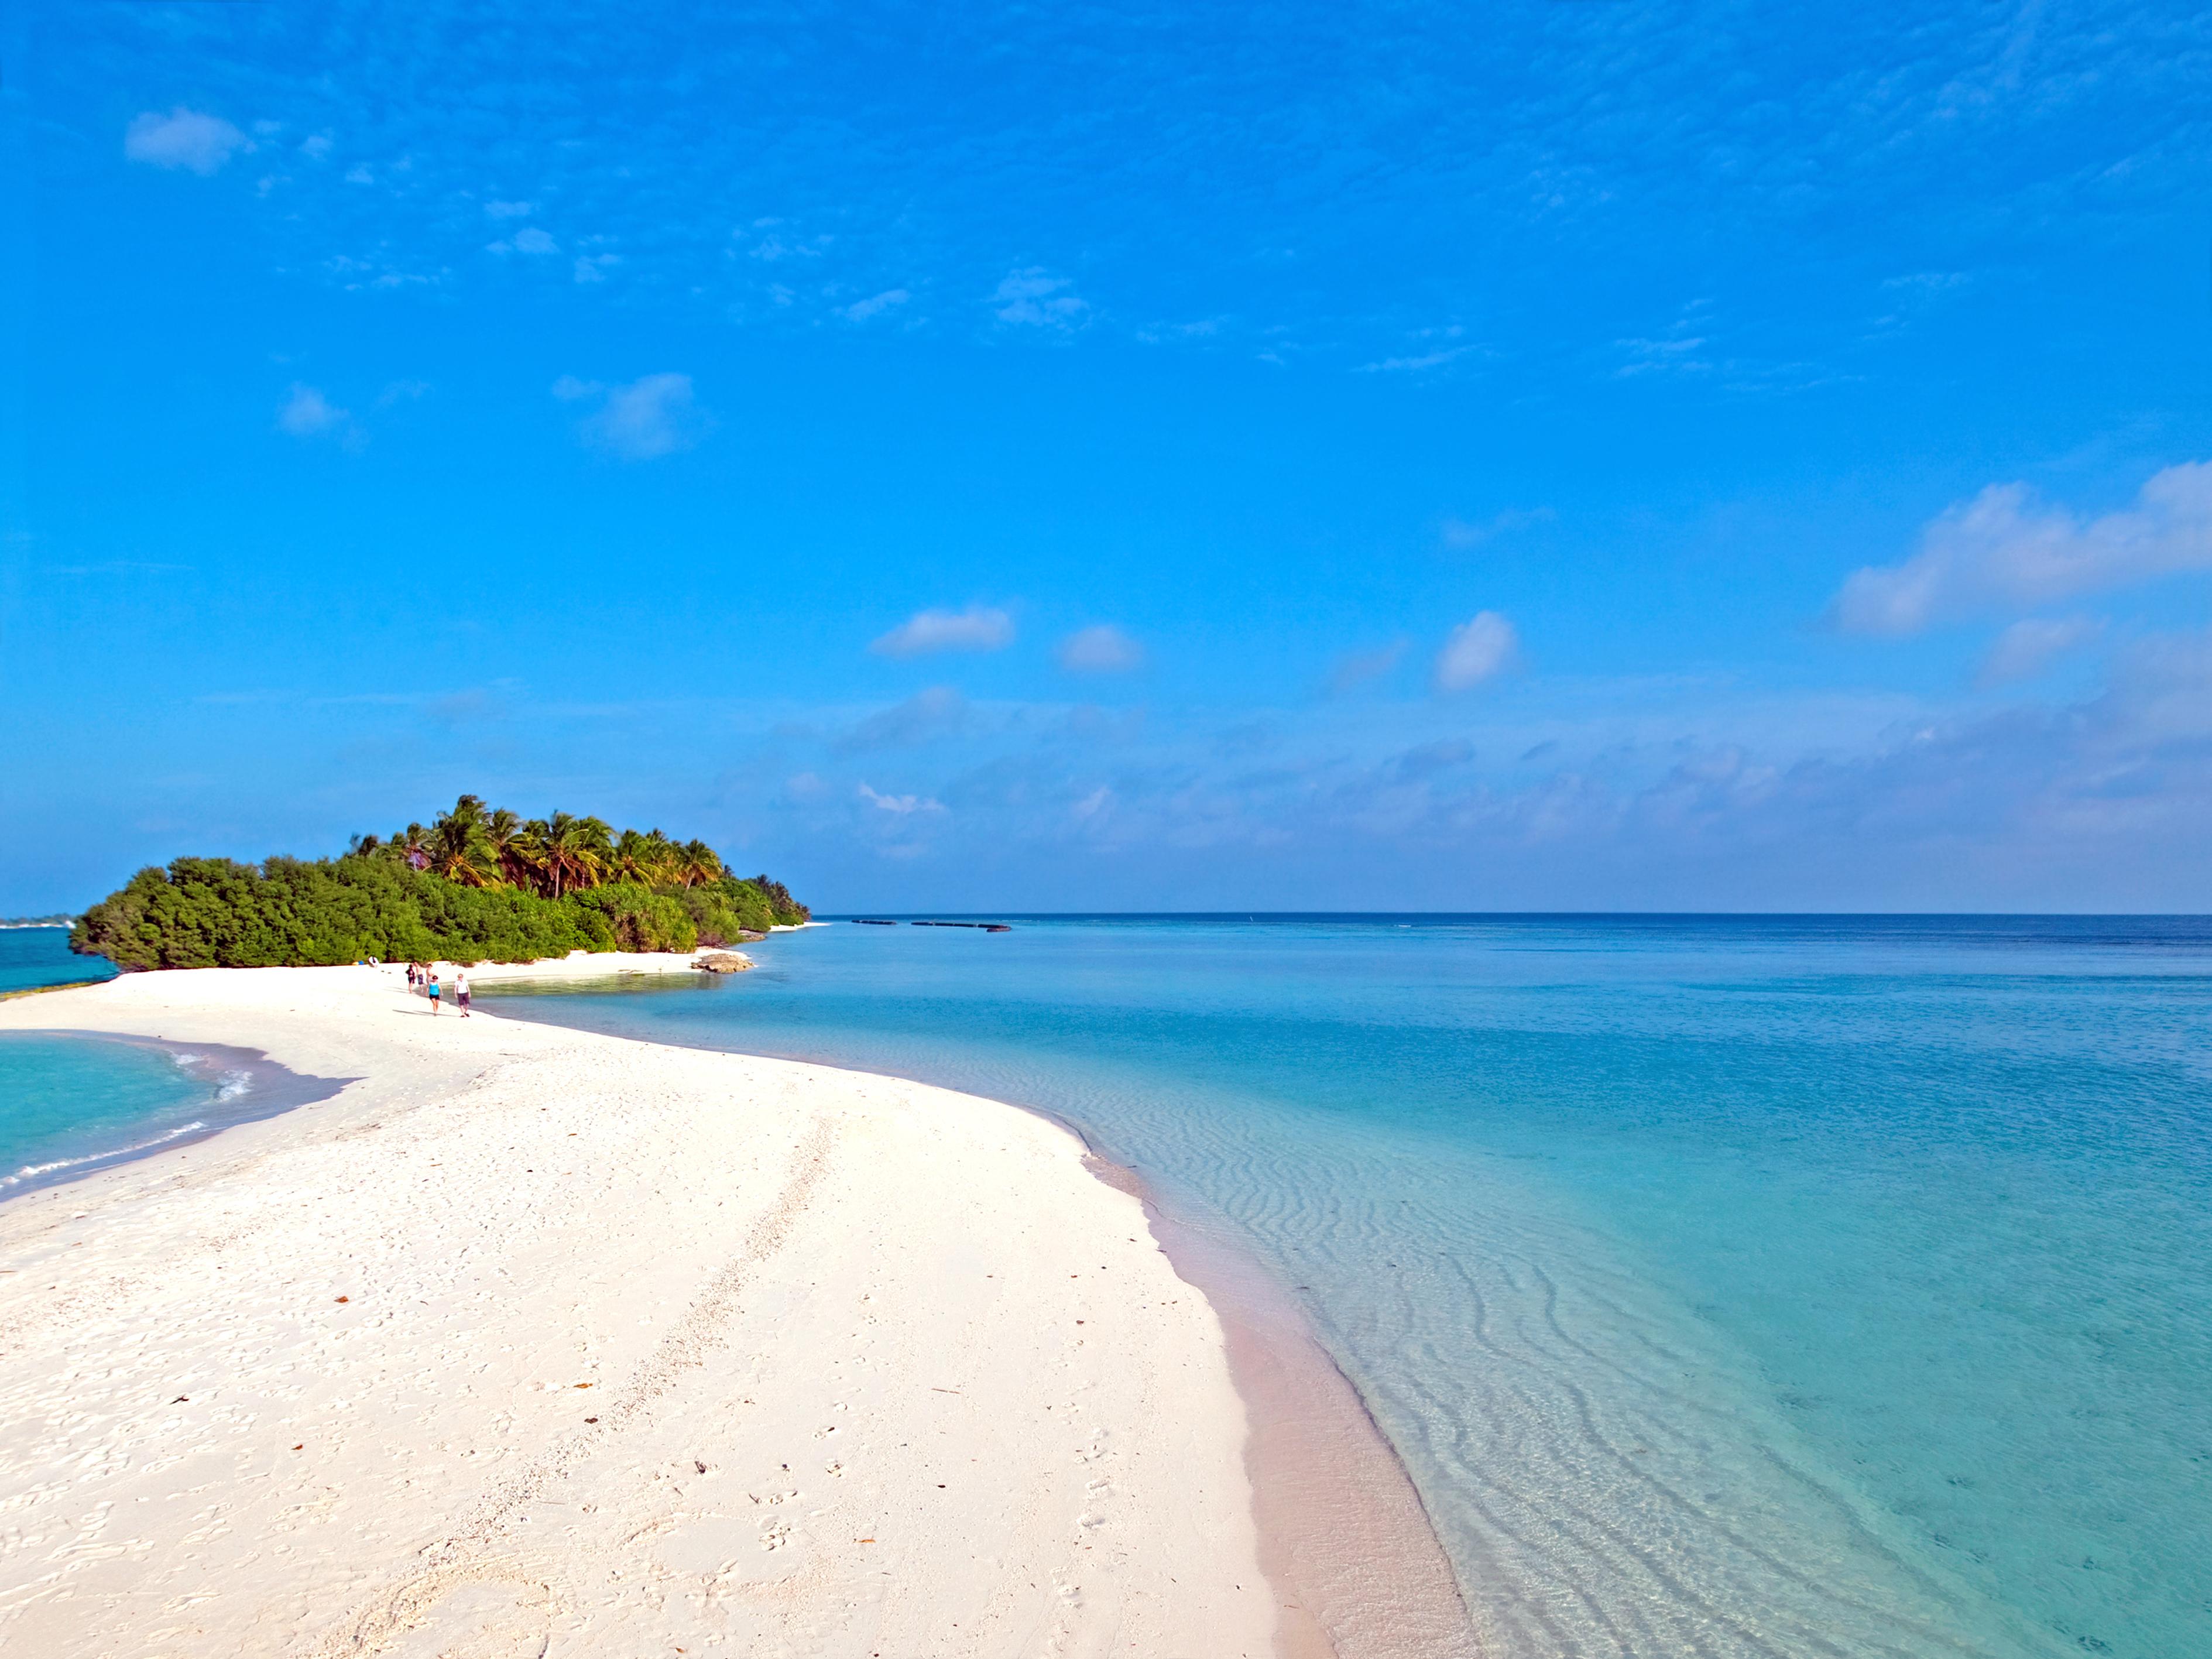 beach background wallpaper,body of water,sea,beach,coastal and oceanic landforms,blue